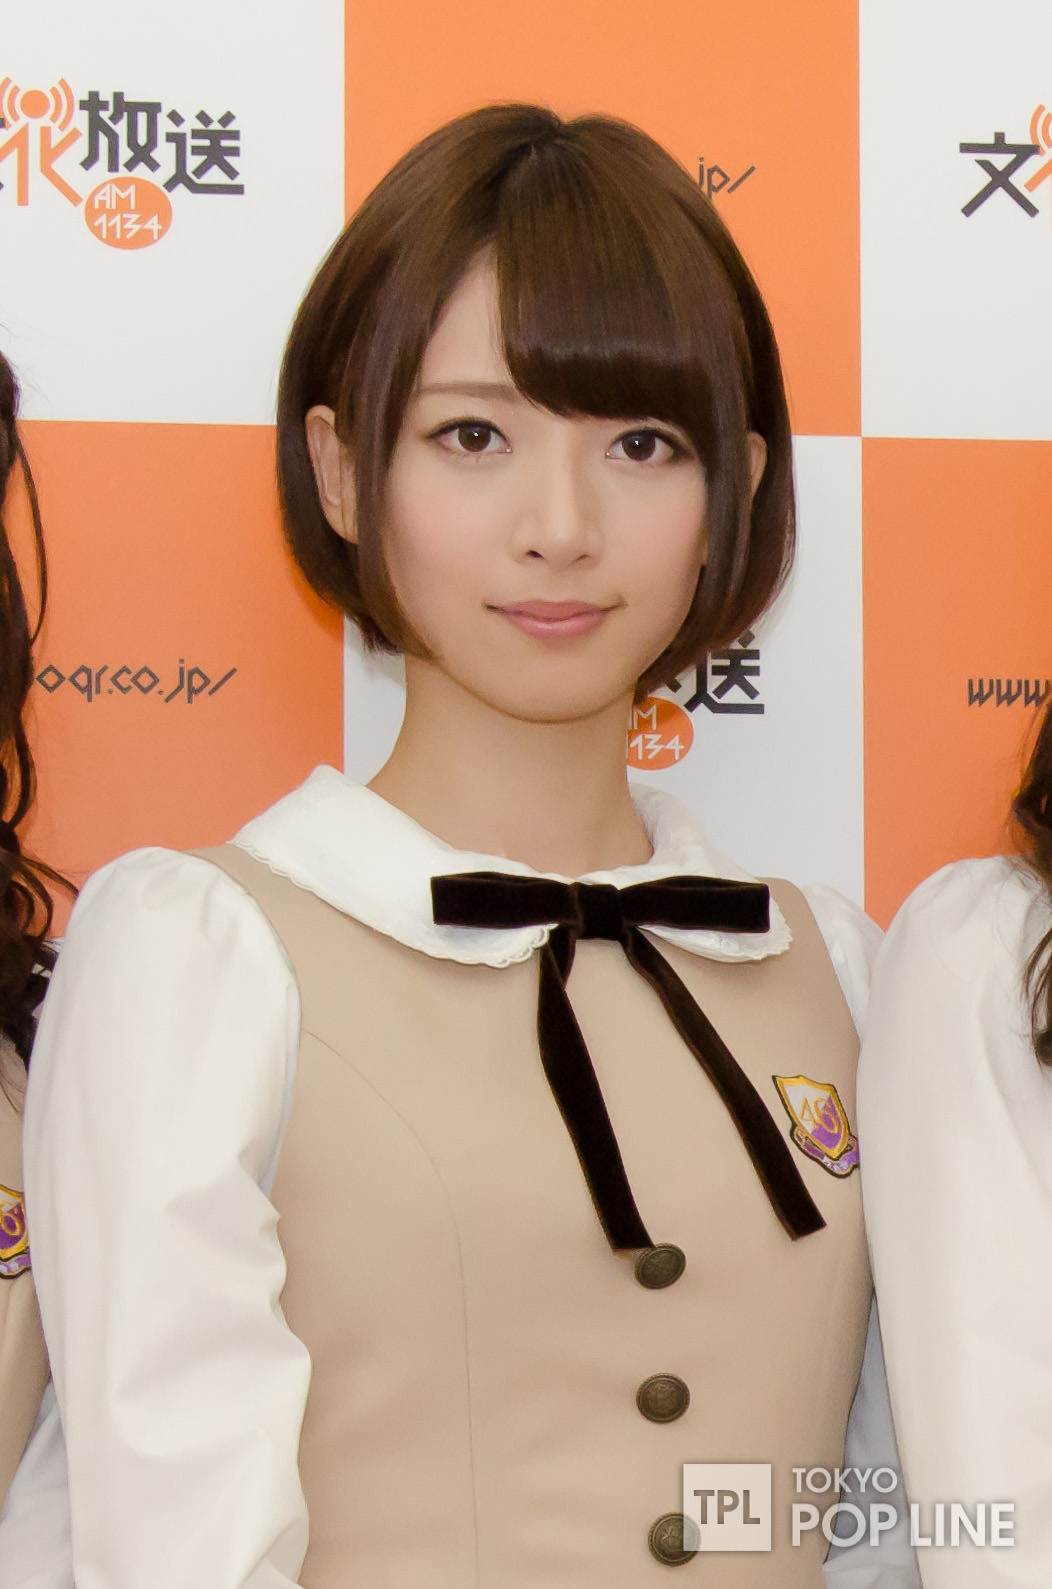 131104hashimoto2.jpg